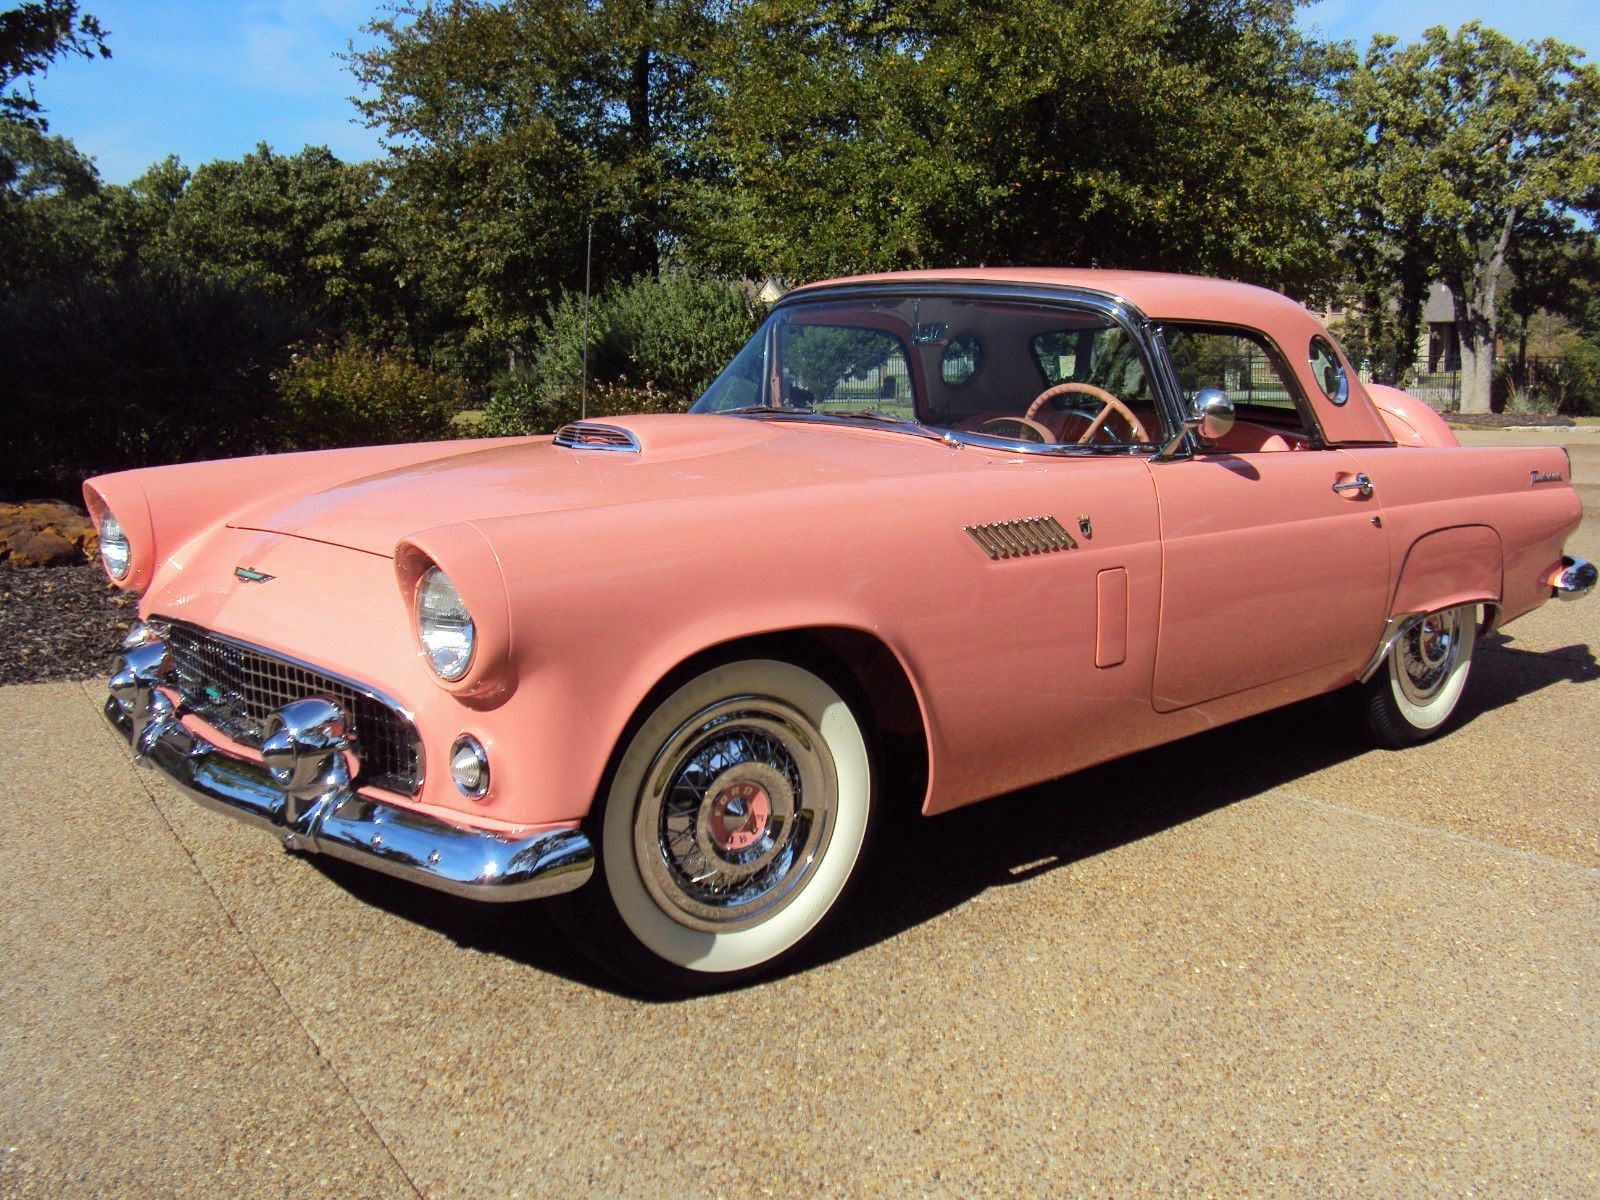 All American Classic Cars 1956 Ford Thunderbird 2 Door Convertible Coches Clasicos Autos Y Motos Y Autos